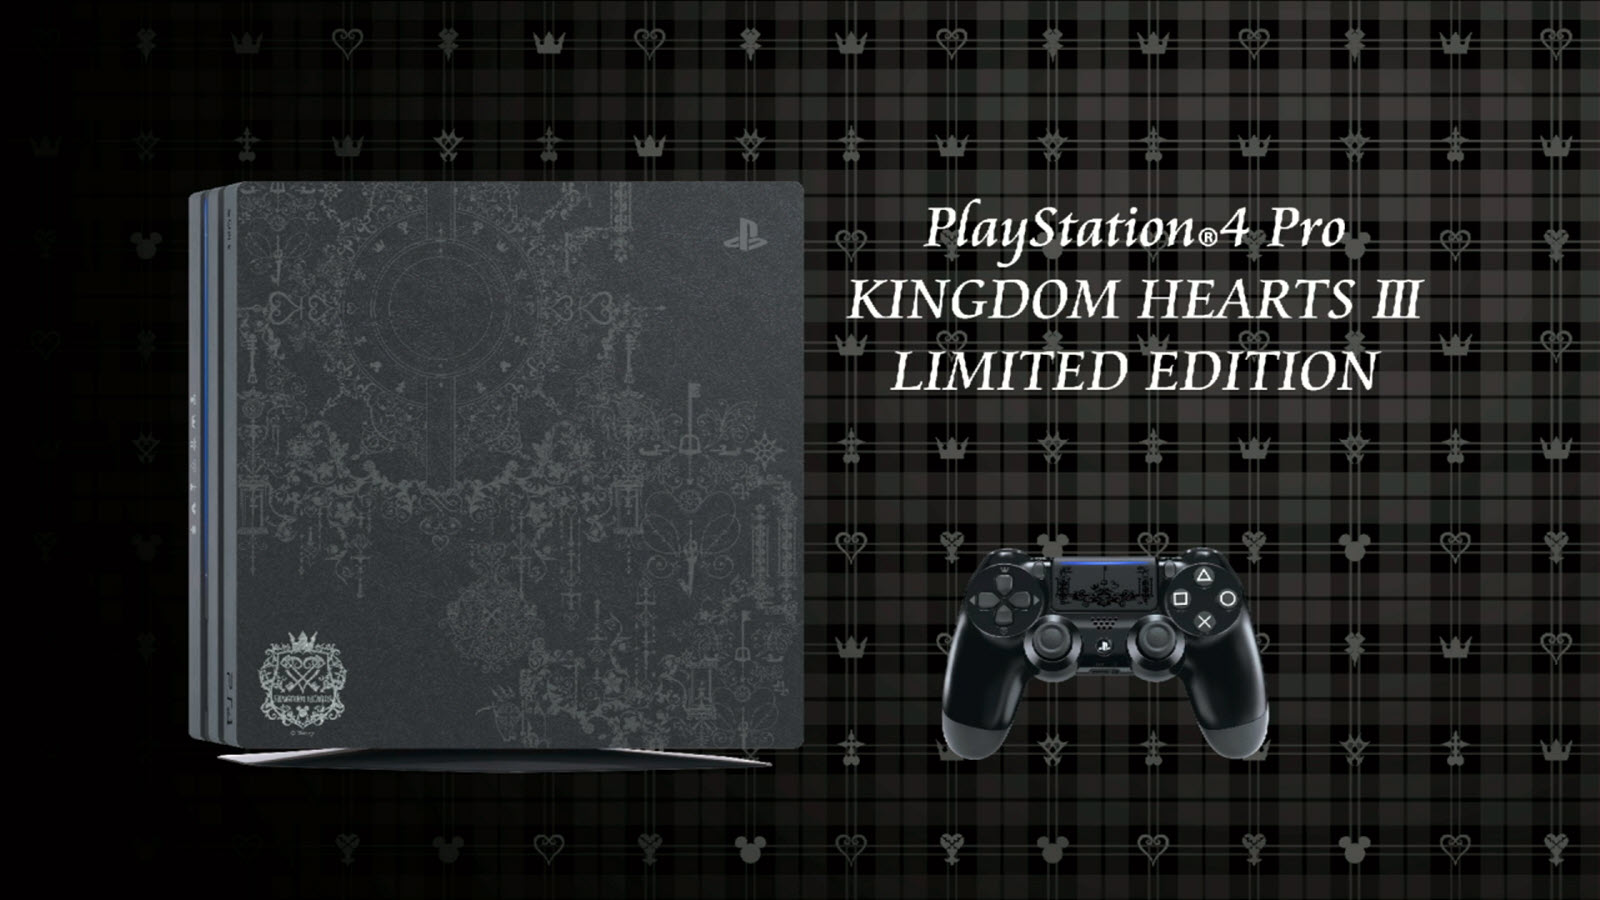 Kingdom Hearts limited edition PS4